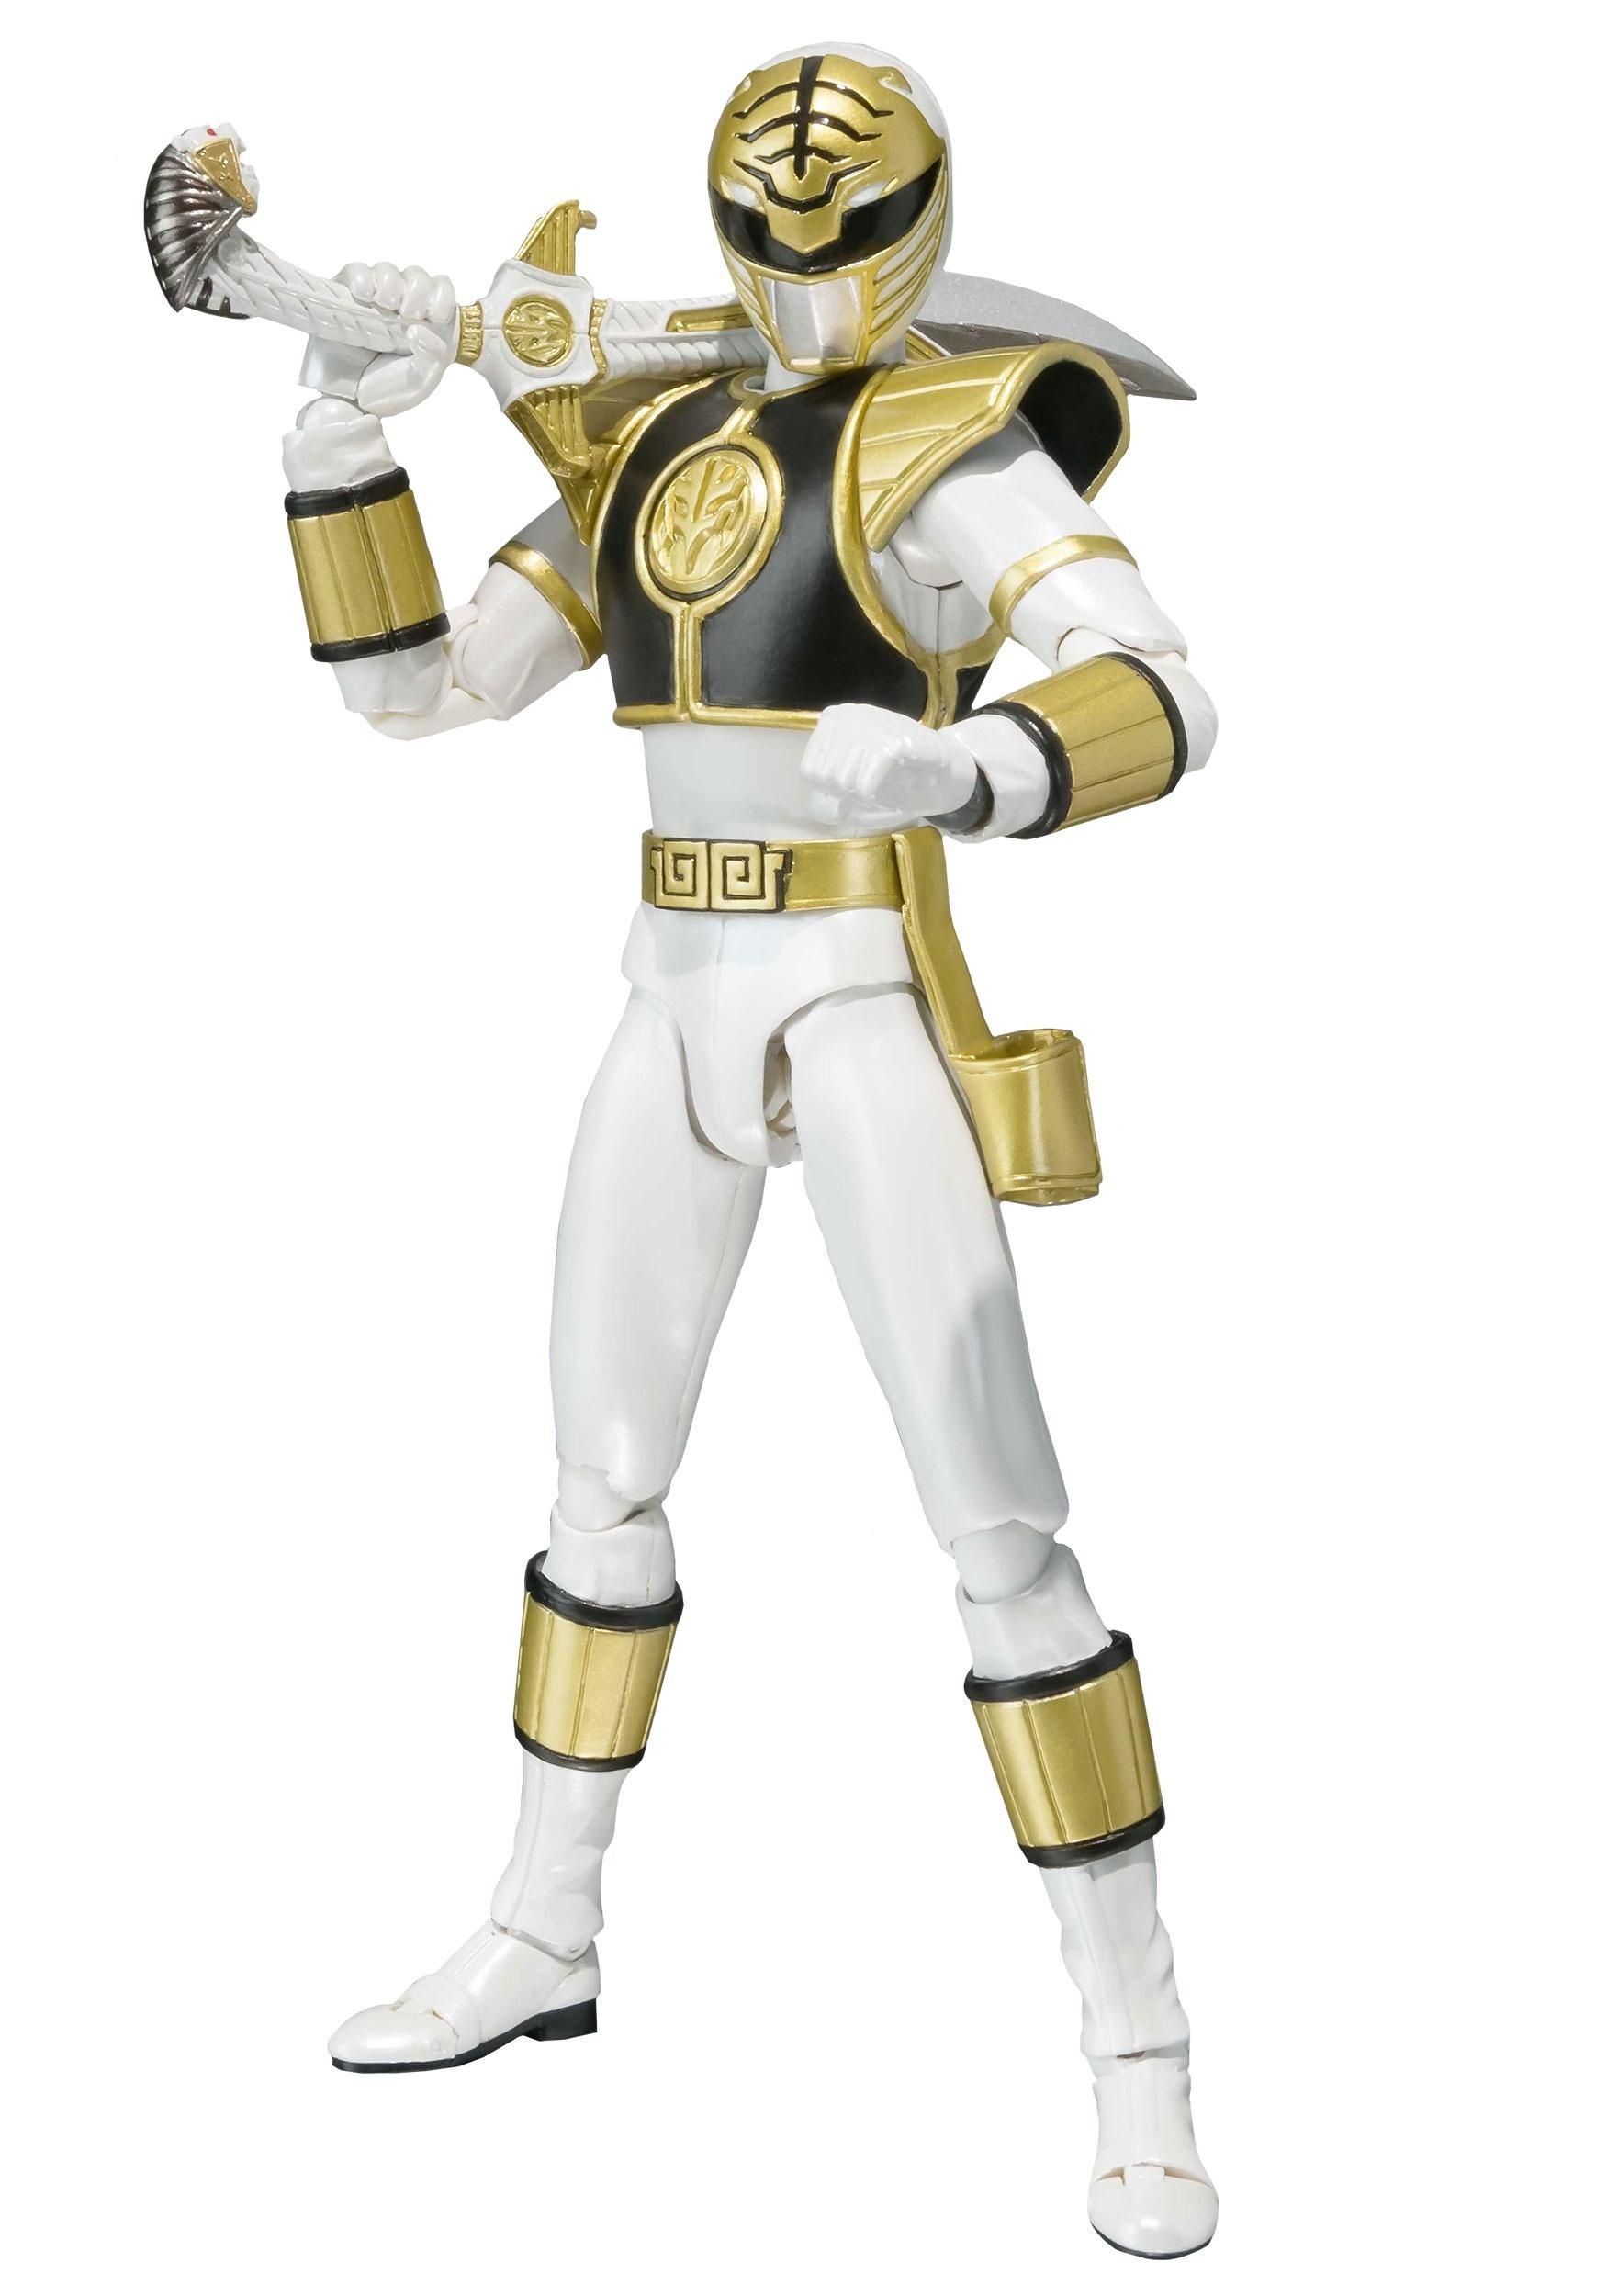 Bandai_White_Ranger_Tamashii_Nations_SH_Figurats_Action_Figure